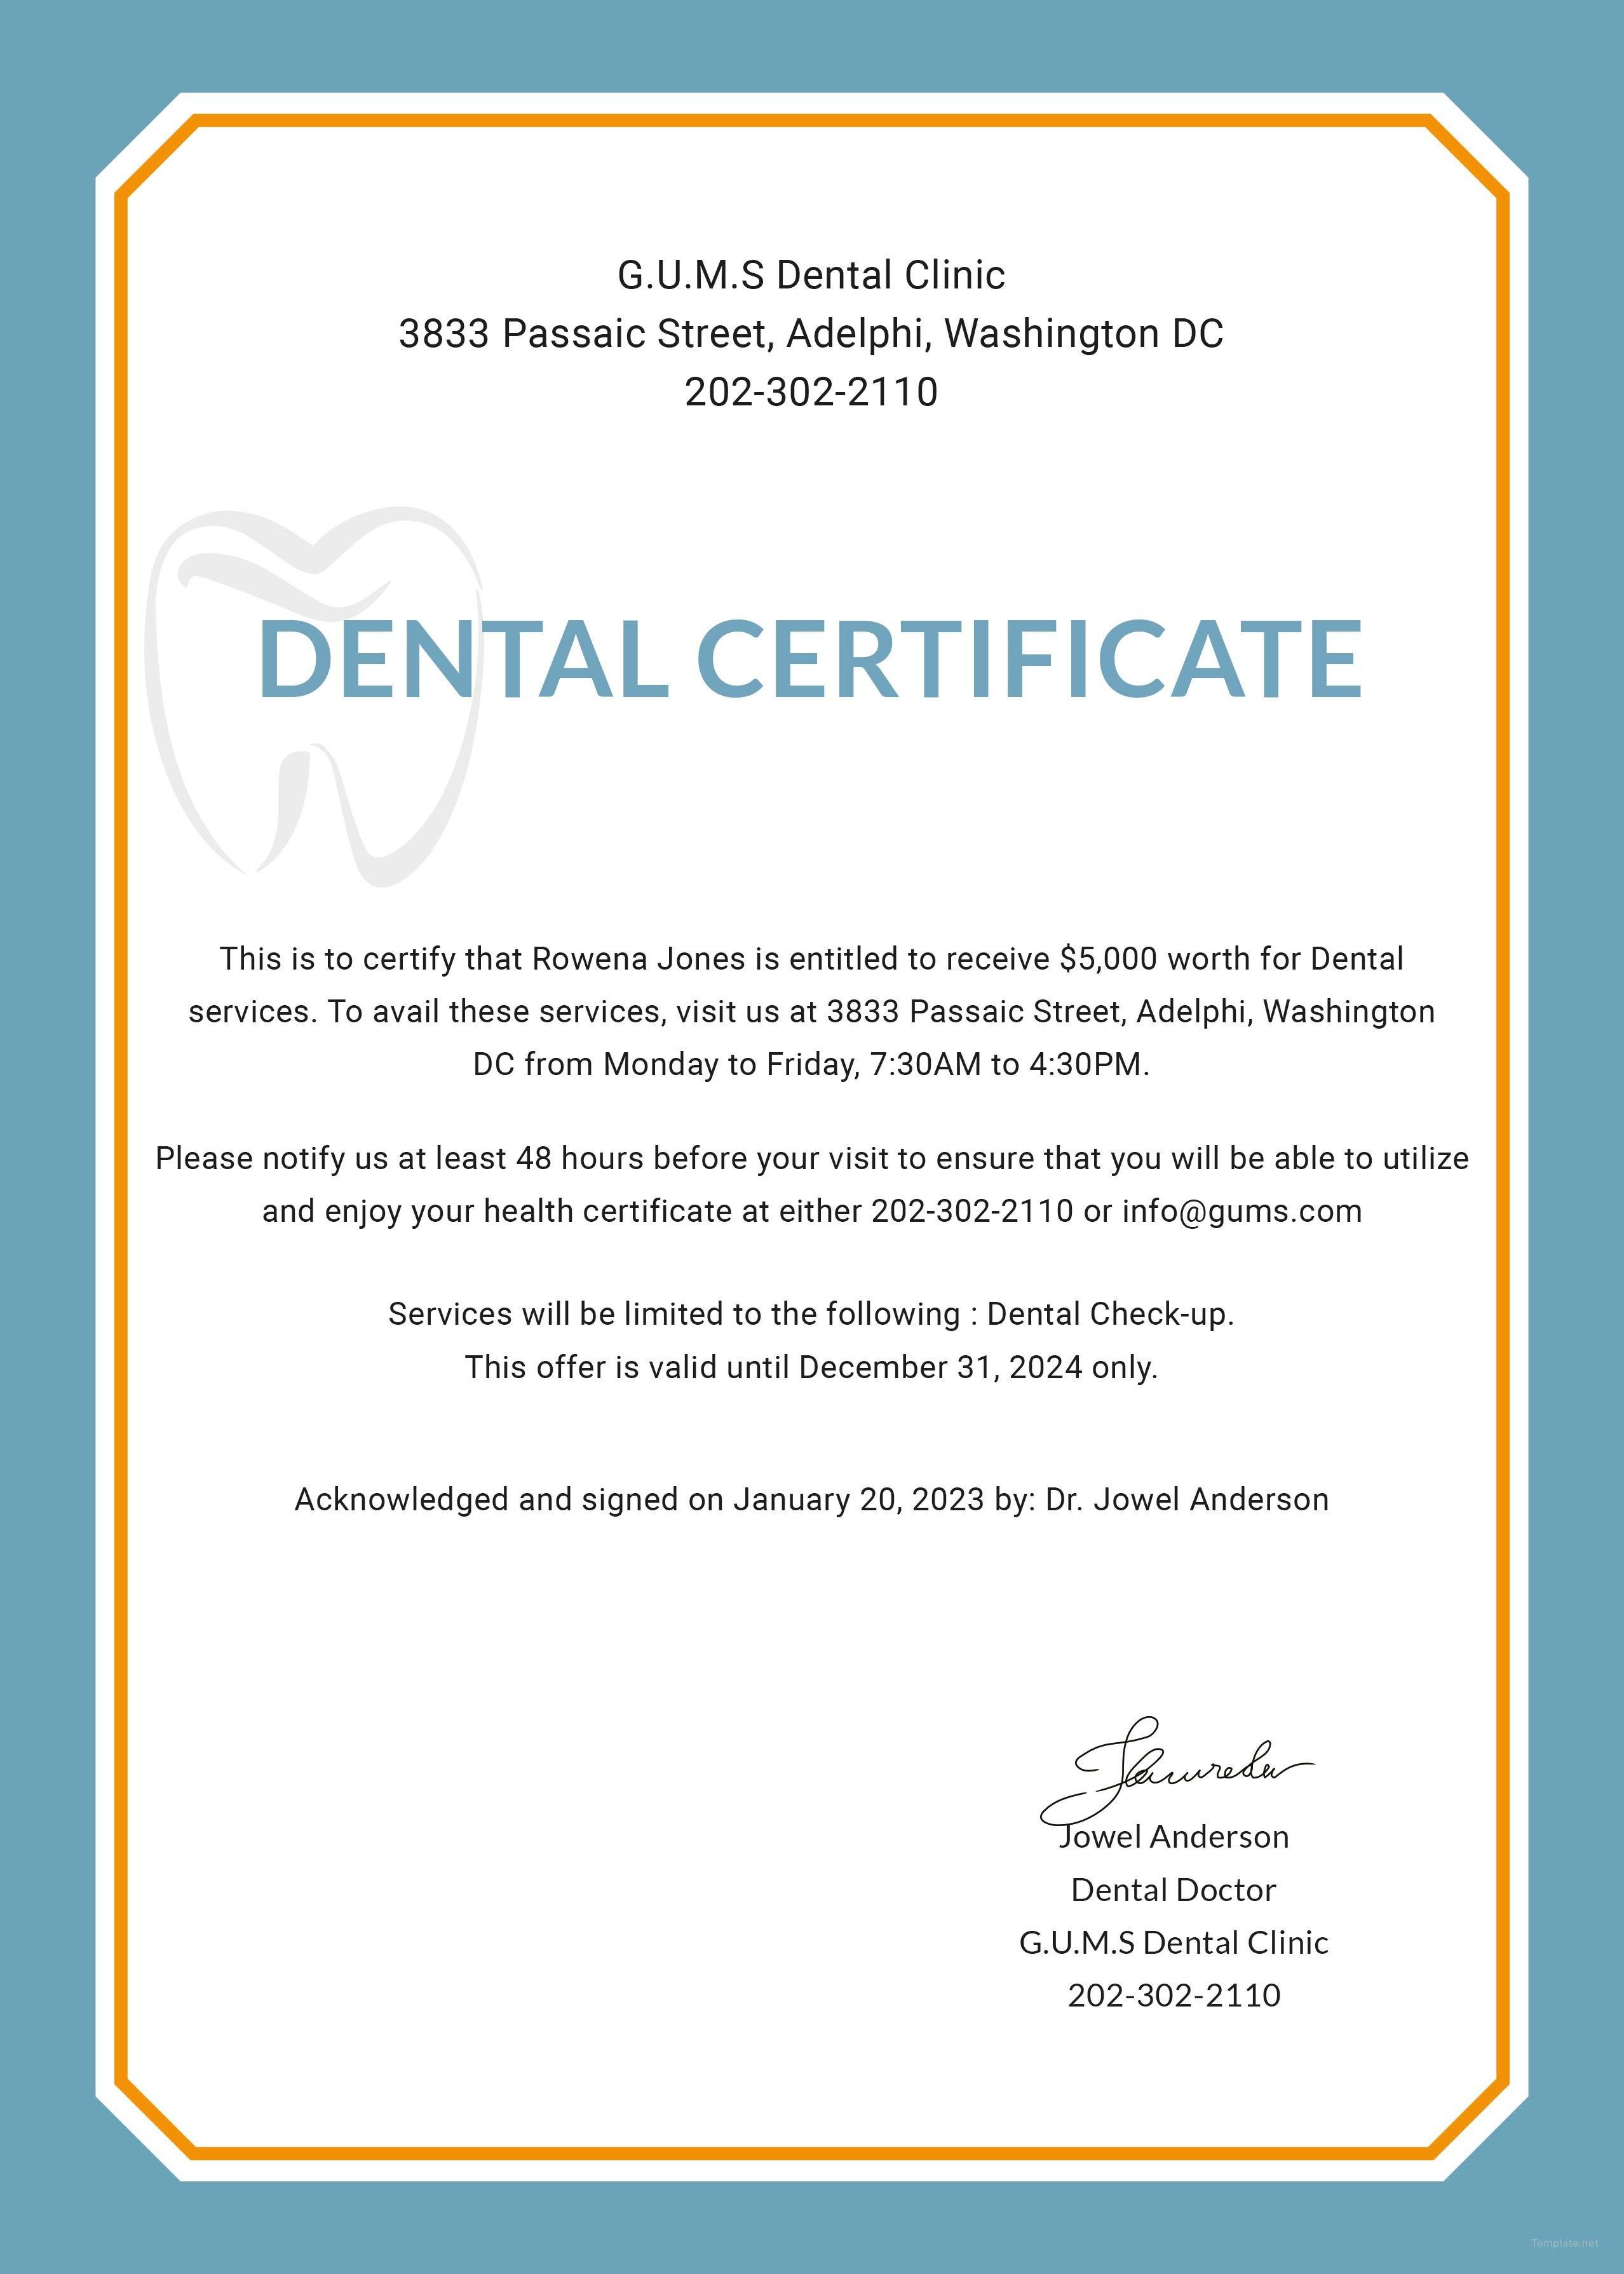 Free Dental Medical Certificate Sample  Psg  Free Dental Dental Pertaining To Free Fake Medical Certificate Template